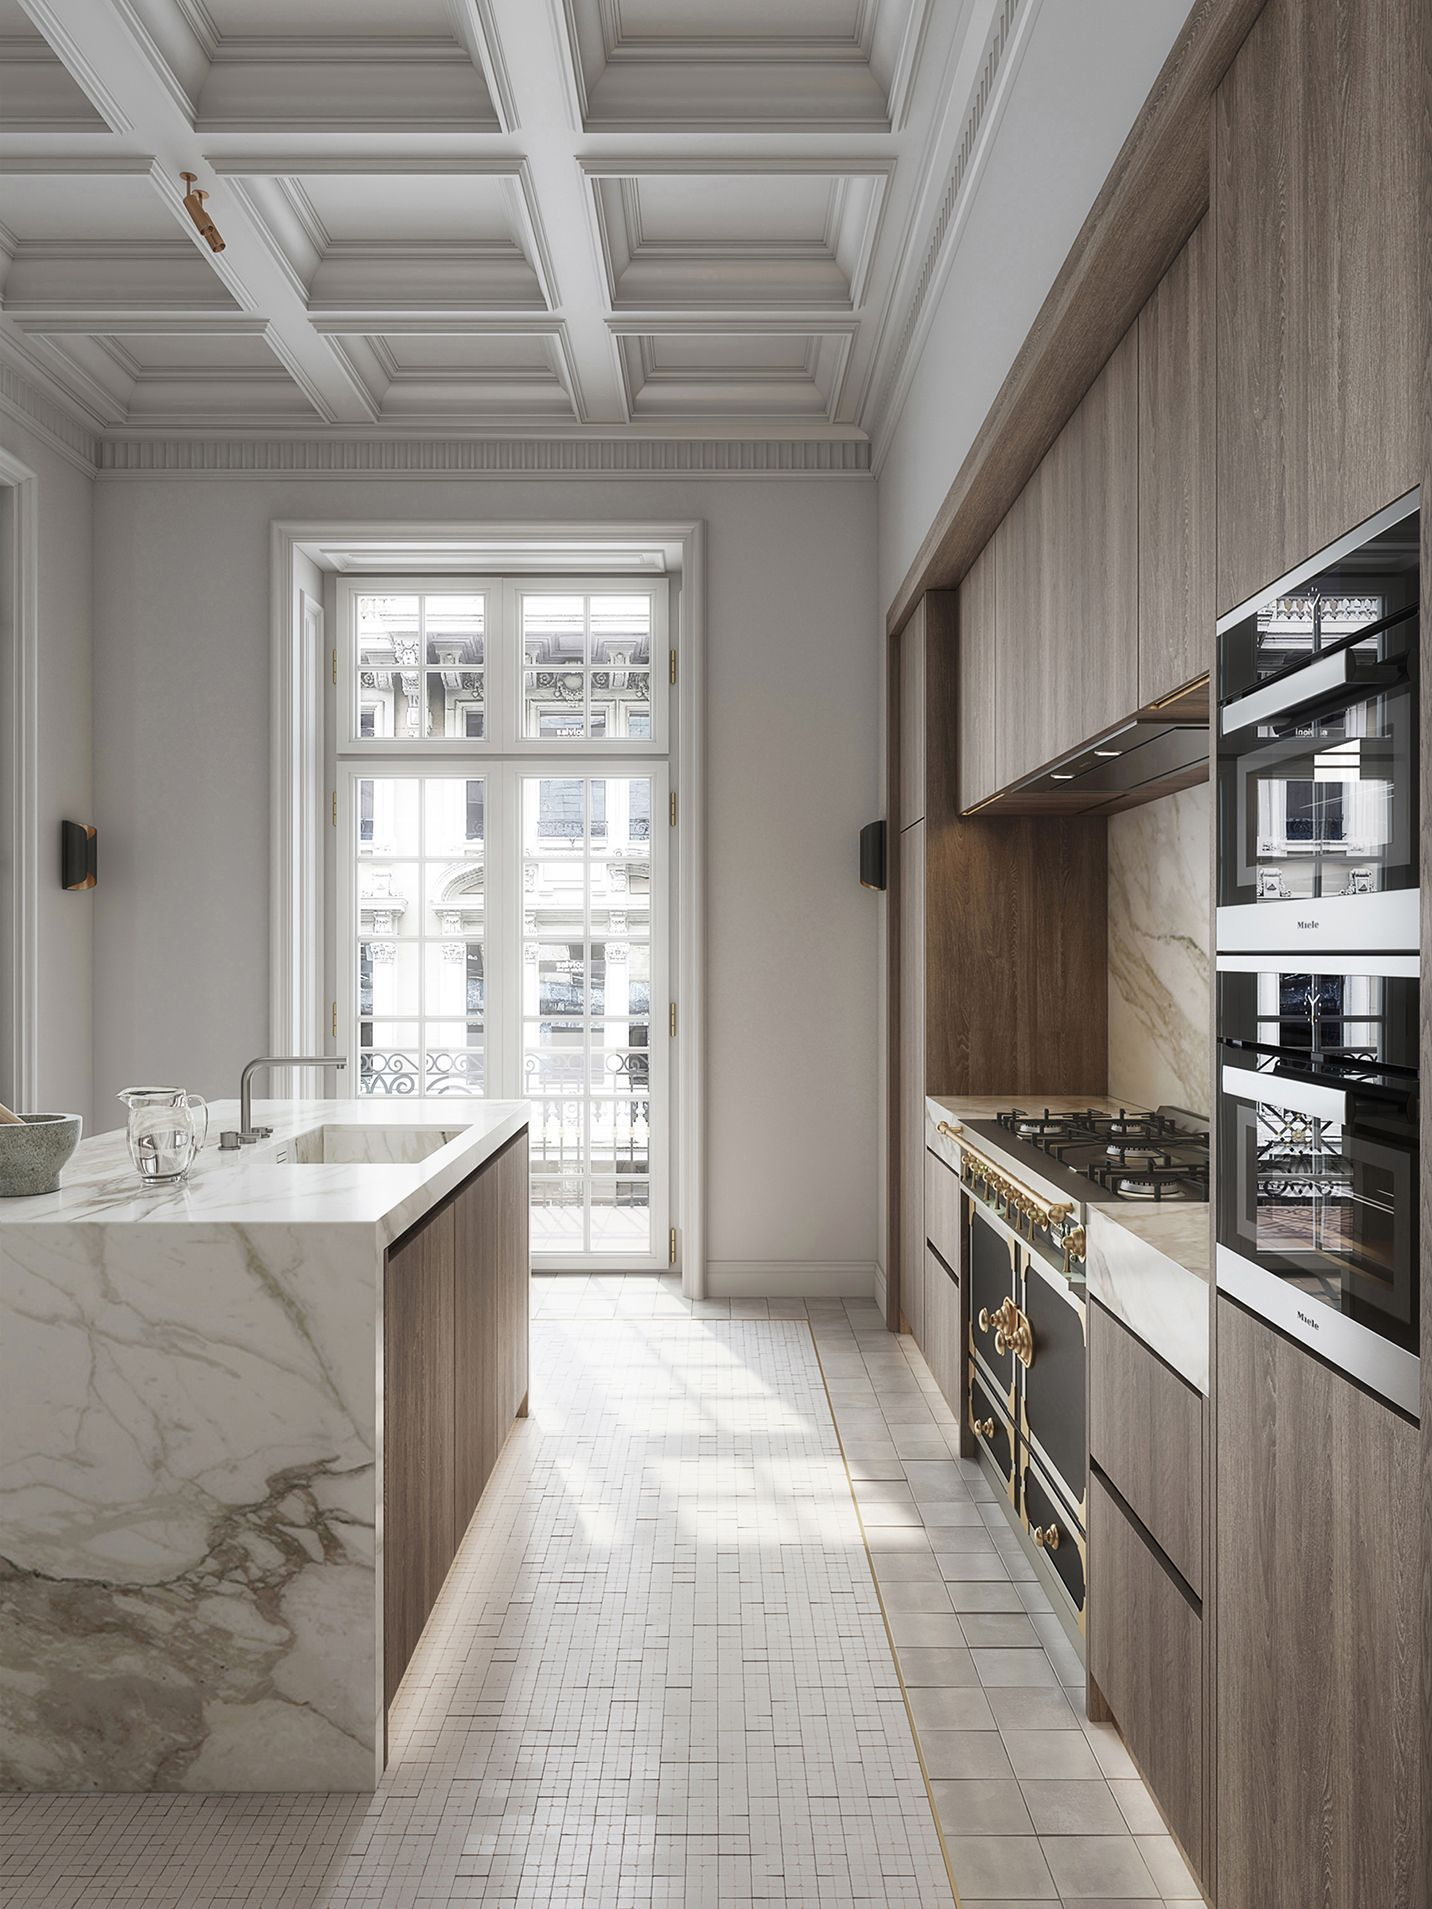 Quadri Cucina Leroy Merlin cucina moderna settembre 2020